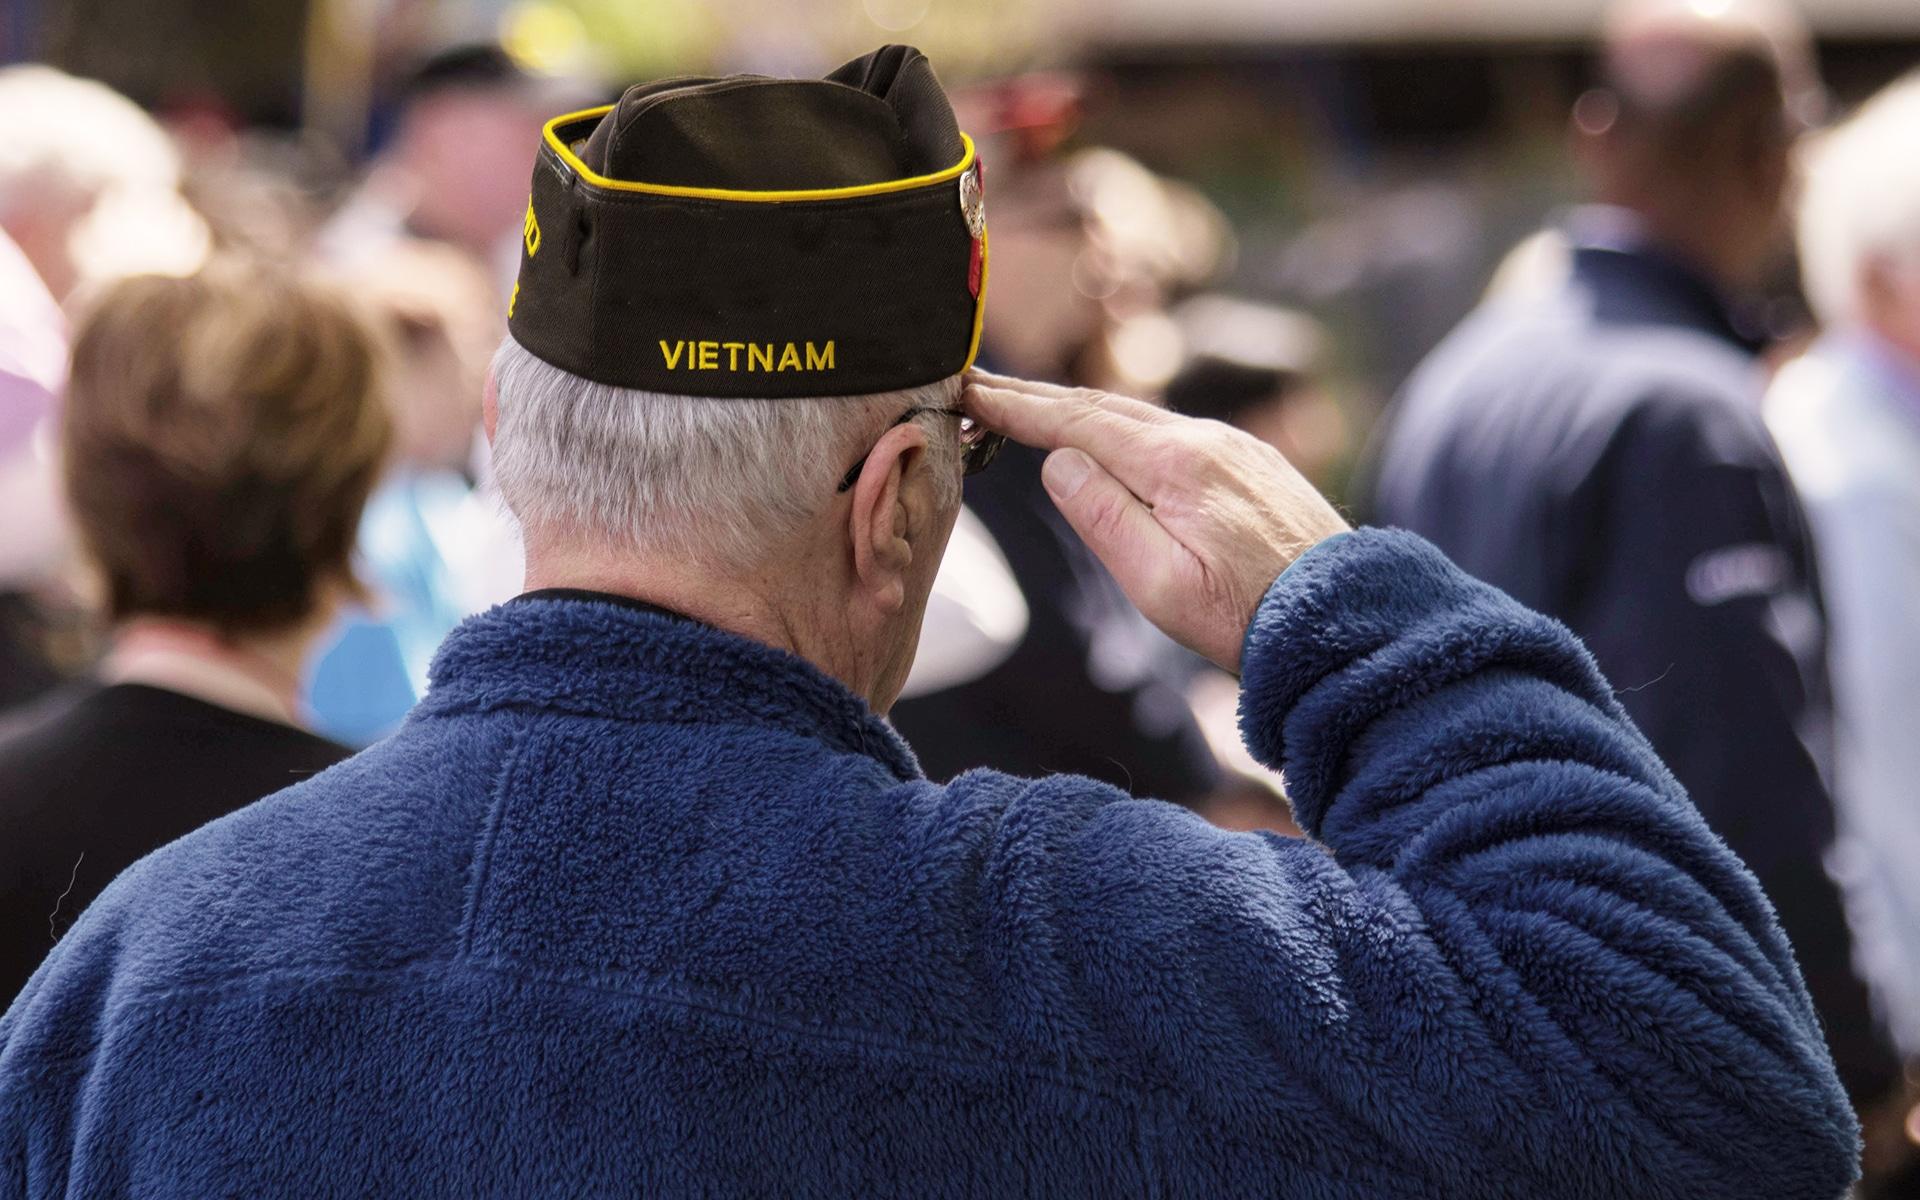 A back view of an elderly Vietnam Veteran saluting in a crowd.